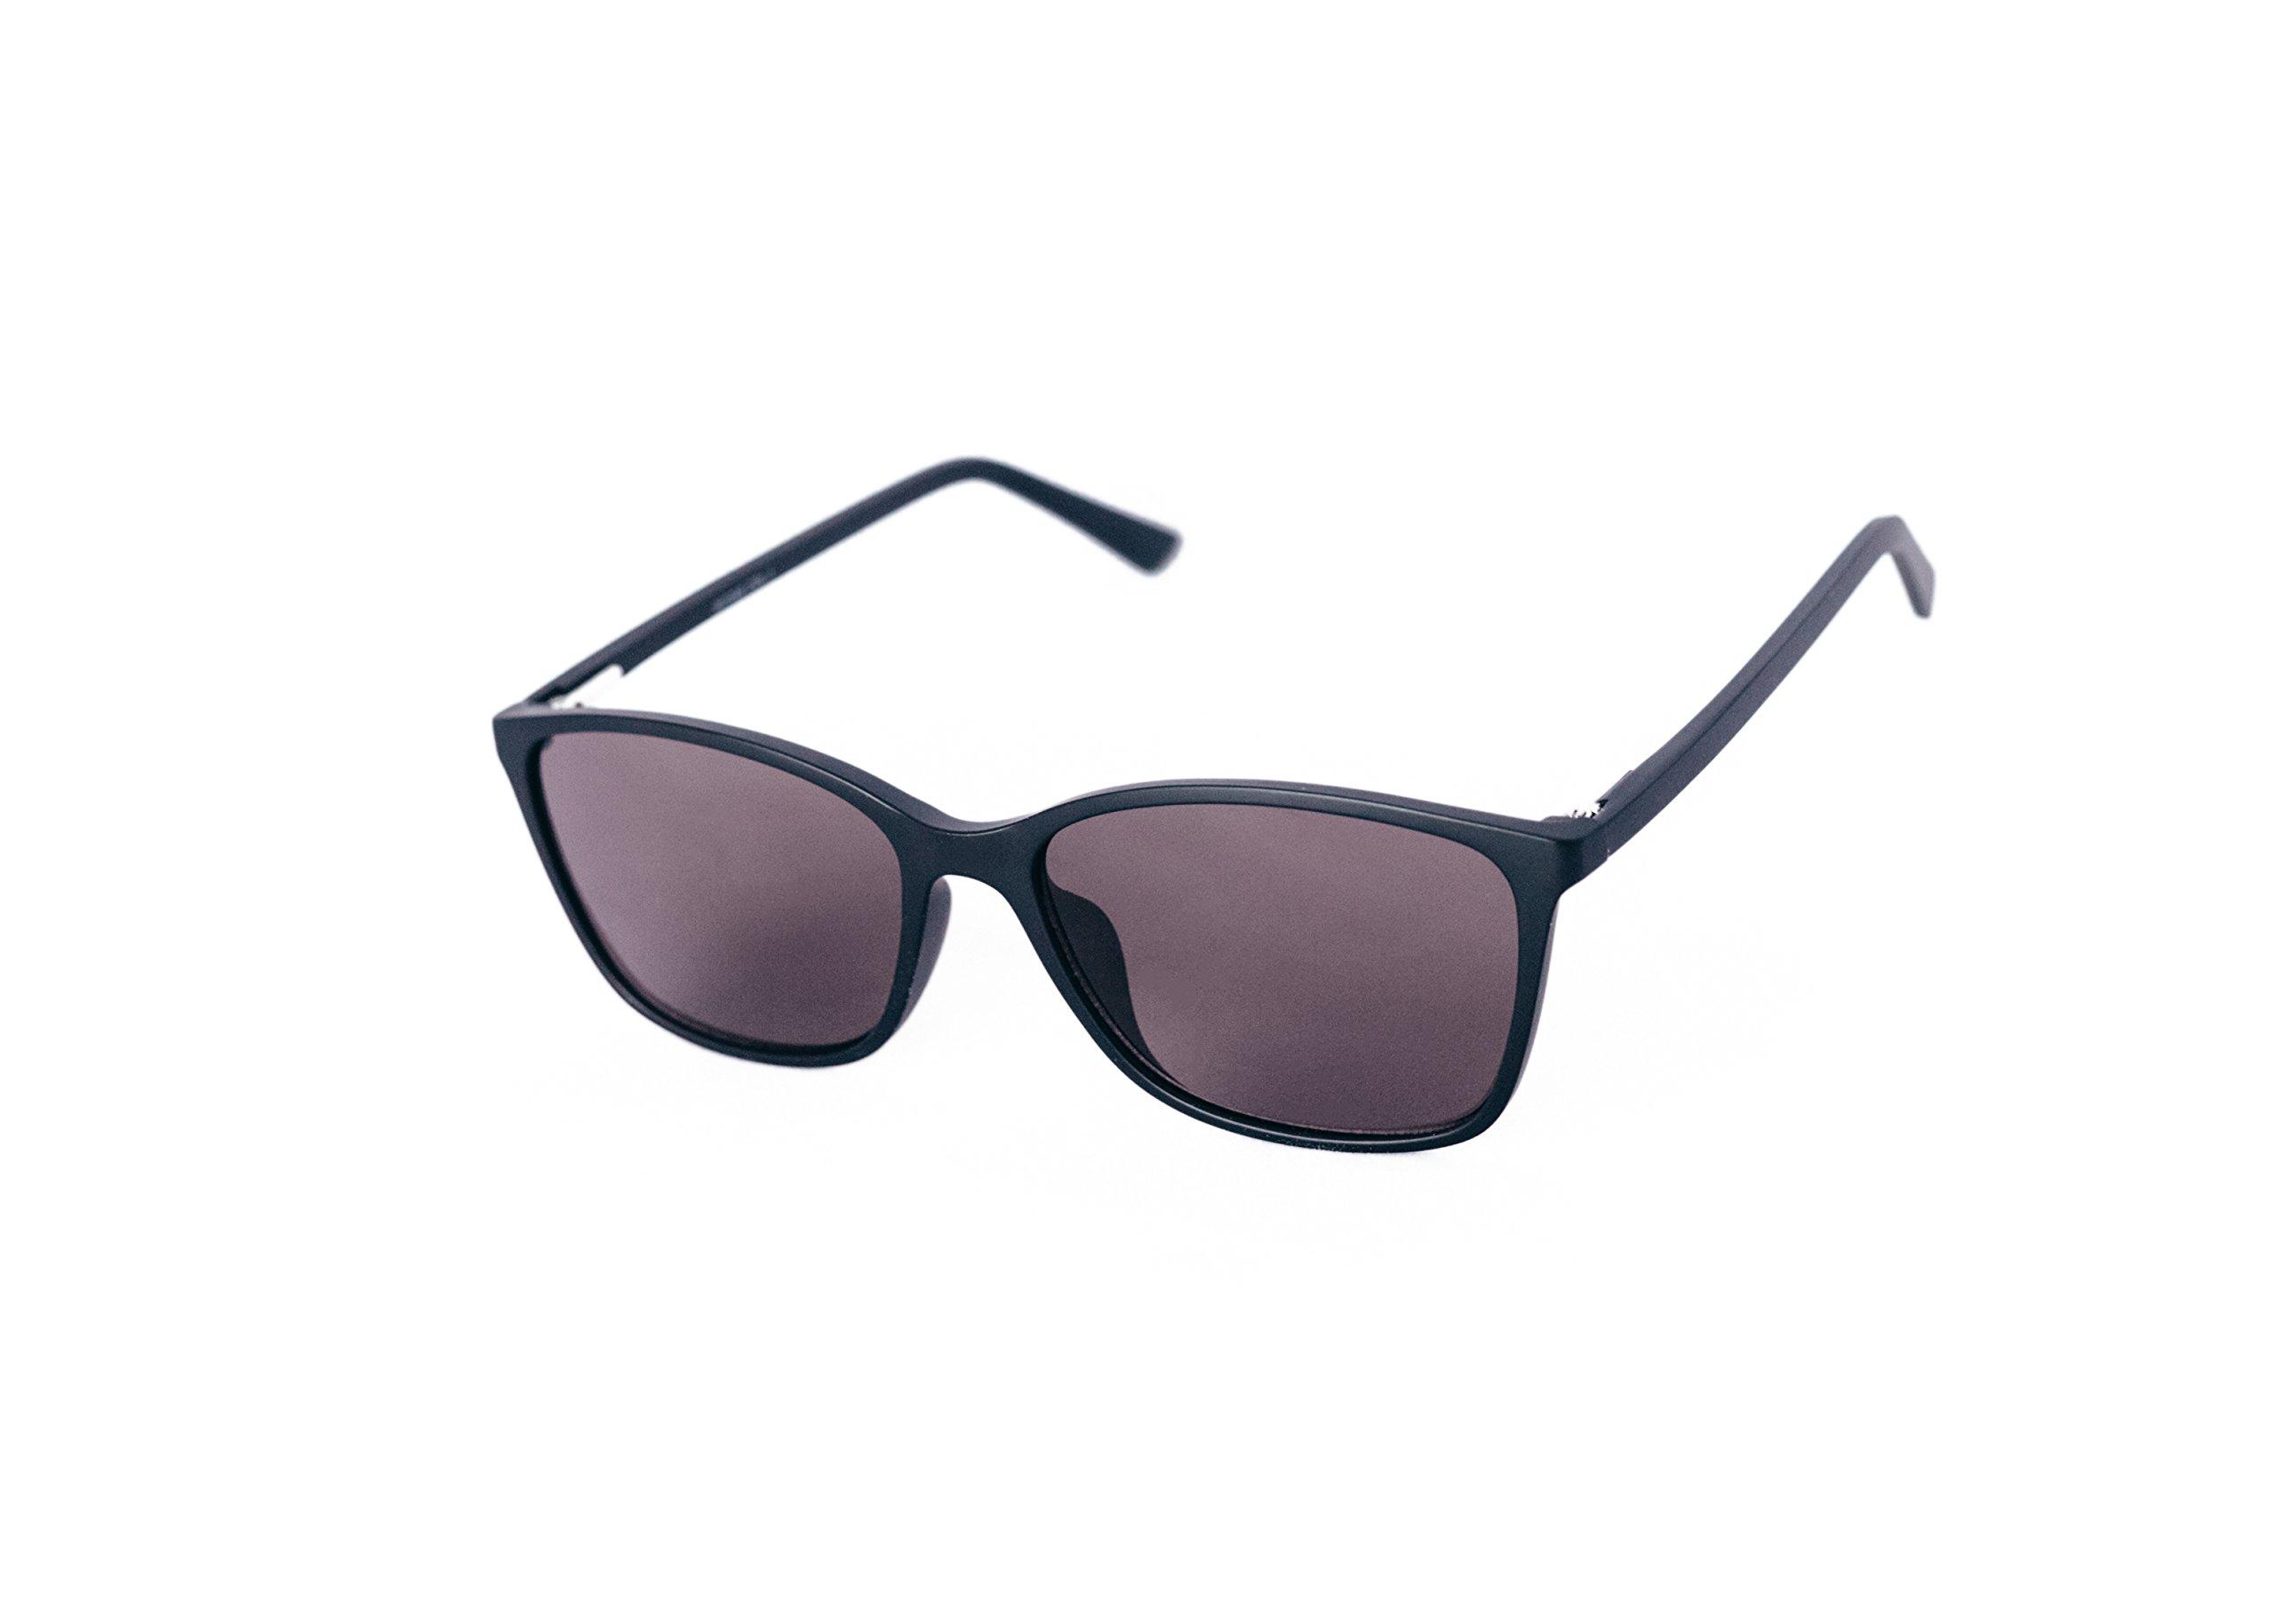 Axon Optics JURA - Migraine Glasses for Migraine Relief and Light Sensitivity Relief (Outdoor Lens)